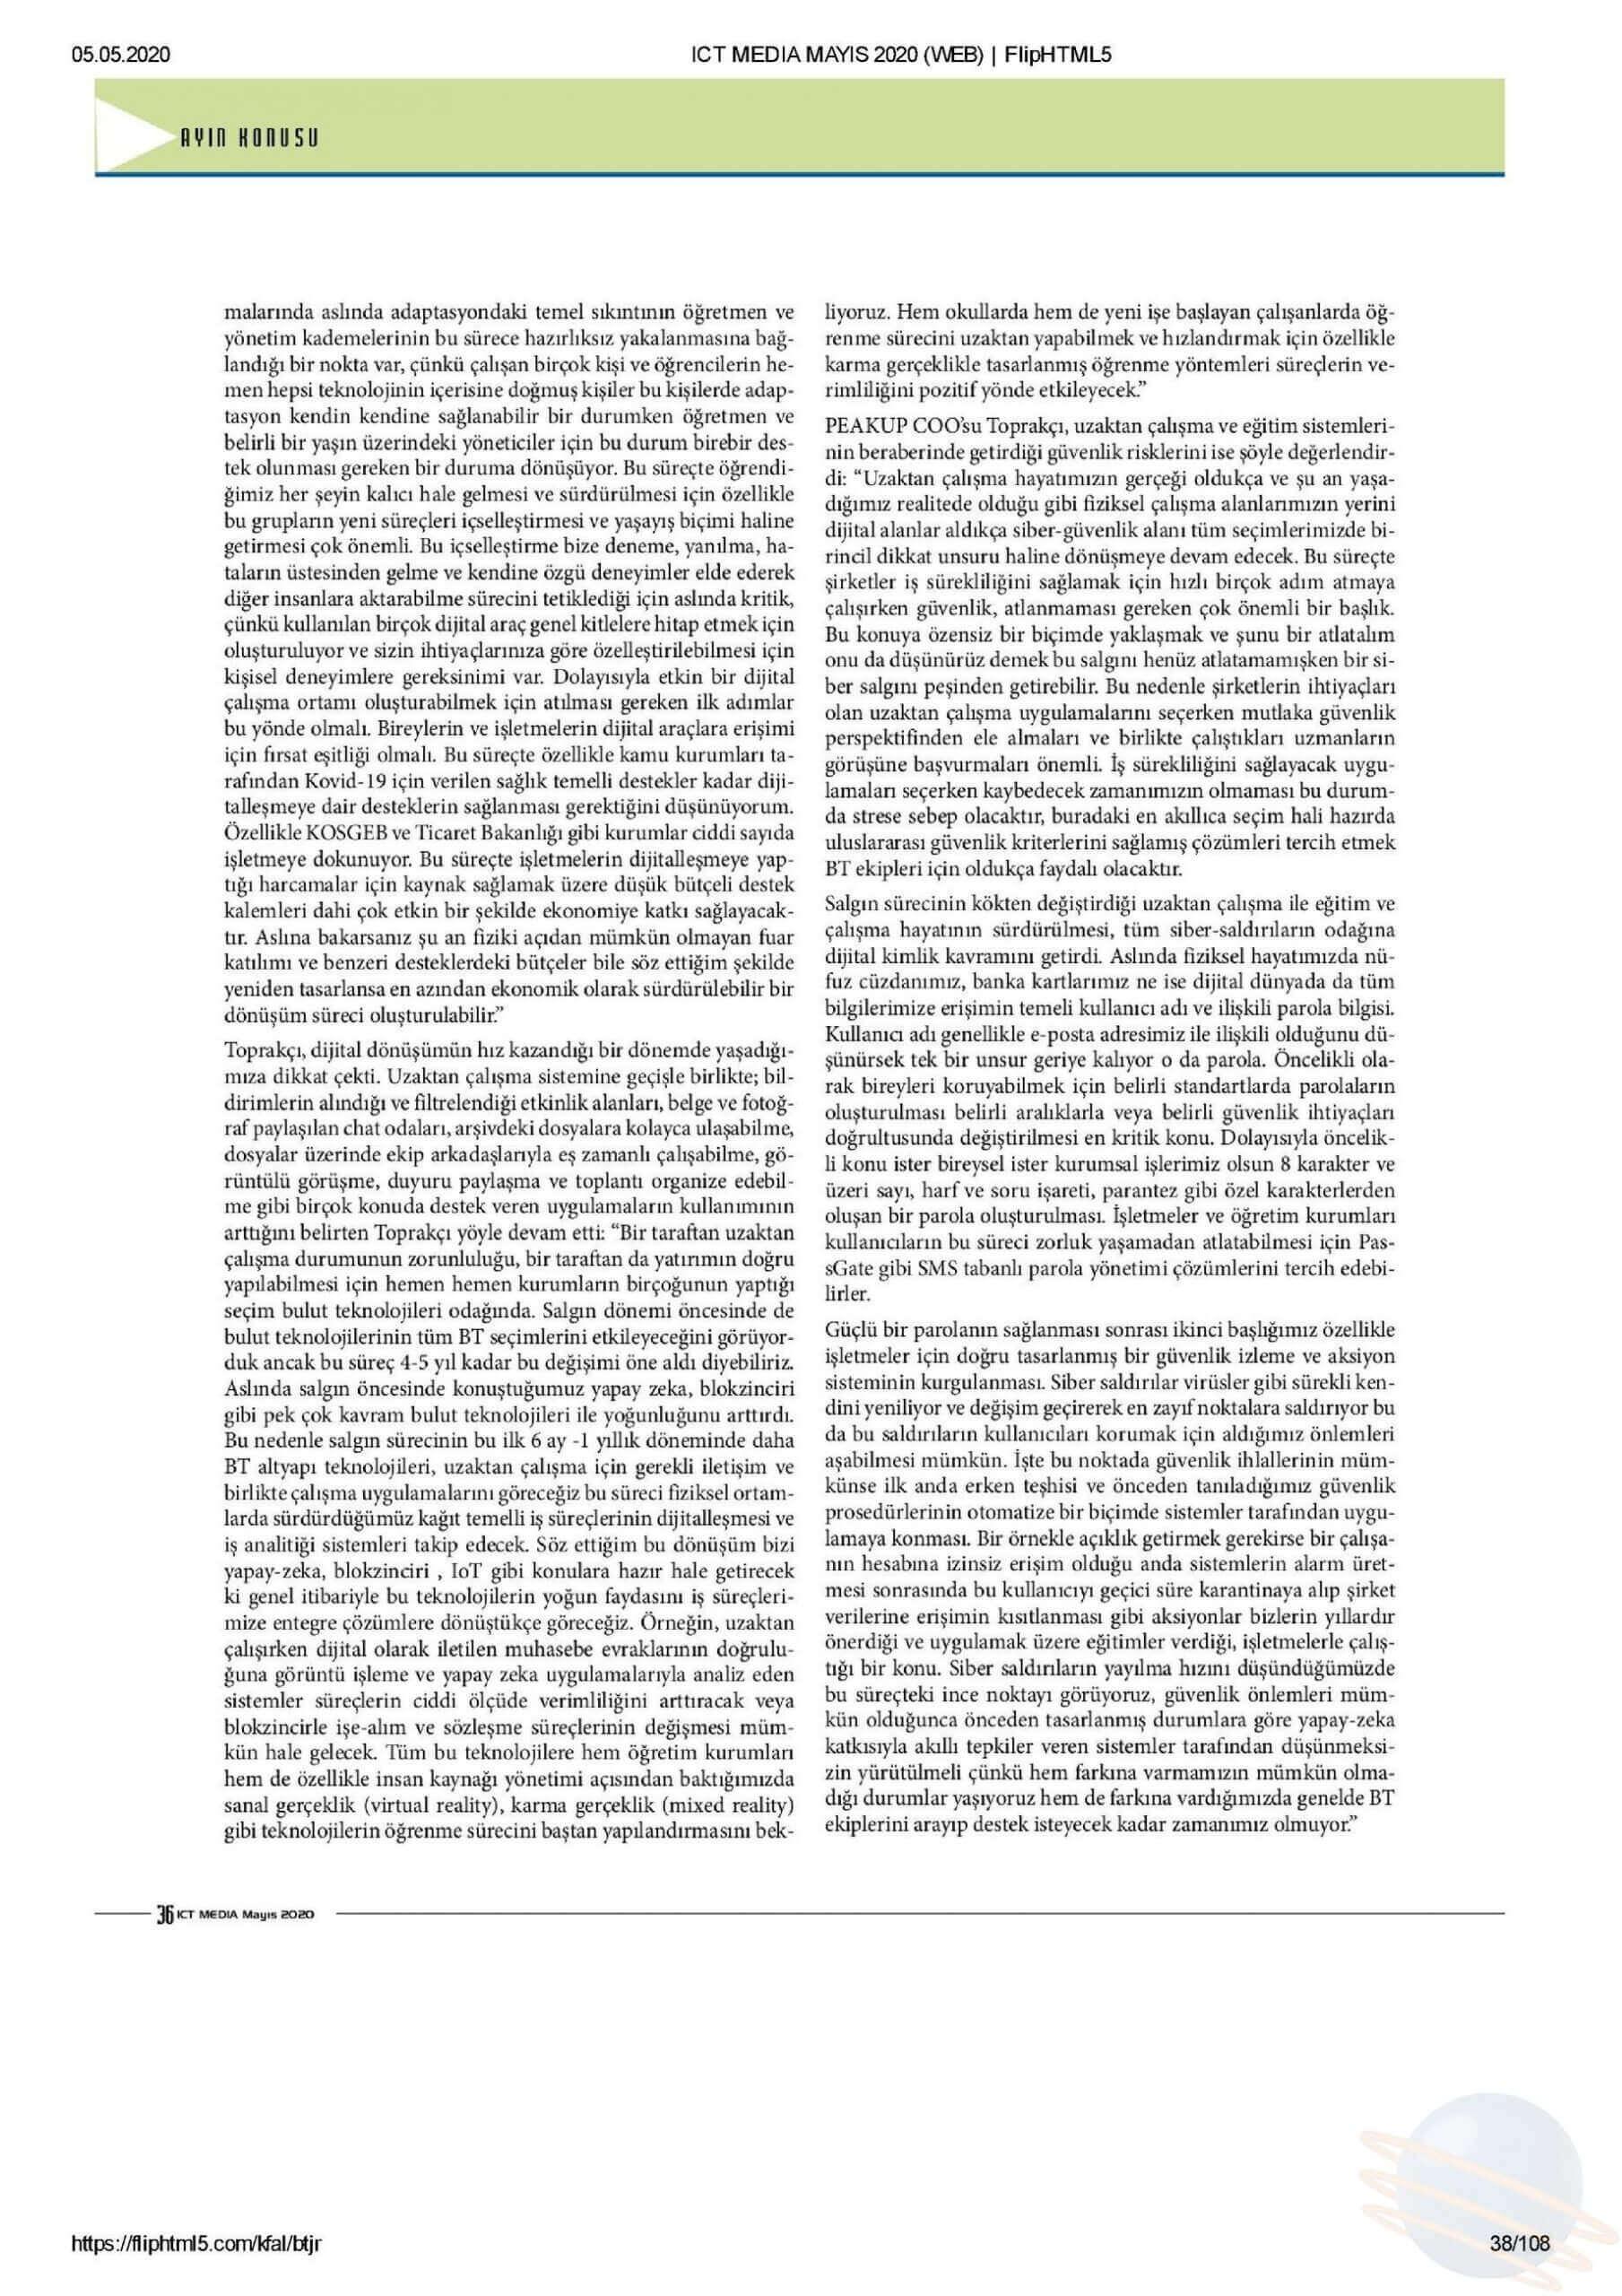 ict-media-3